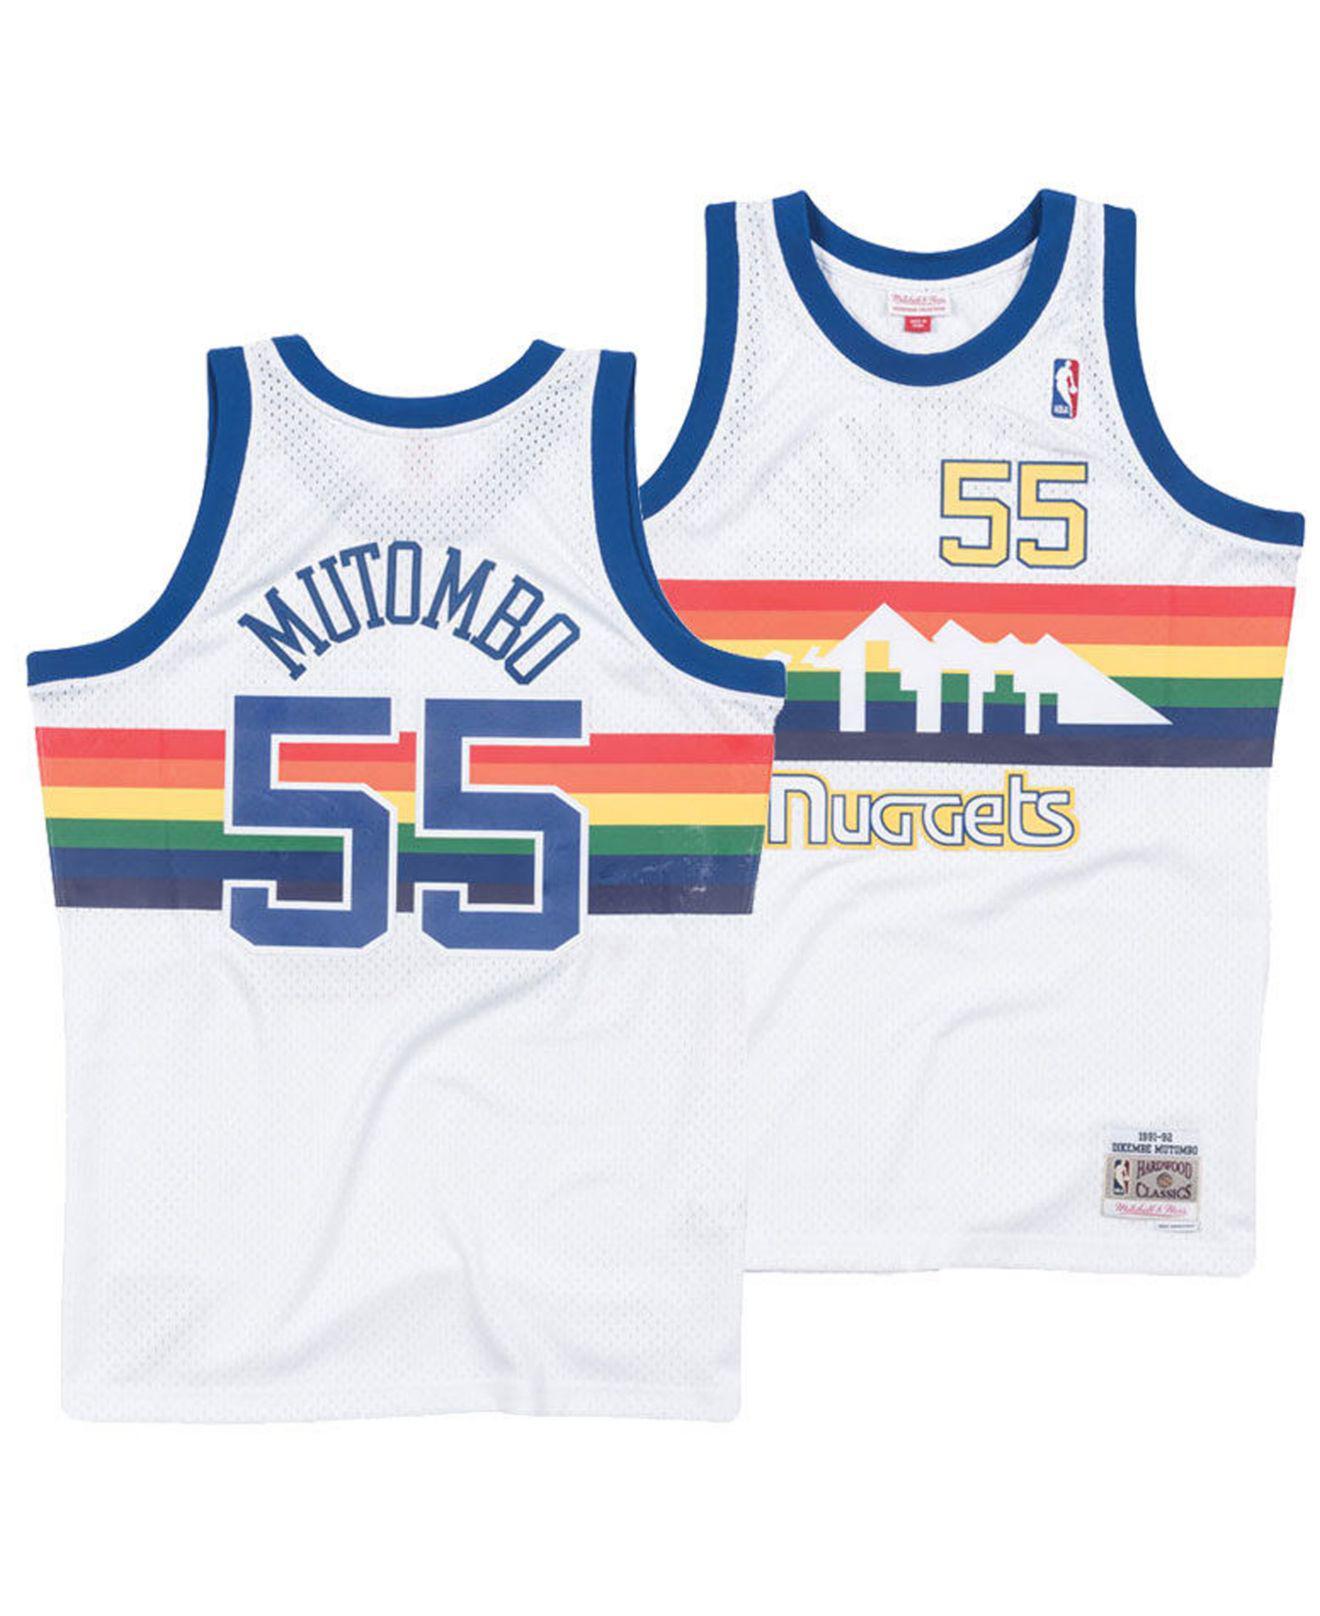 a02e95fe7c6e ... Dikembe Mutombo Denver Nuggets Hardwood Classic Swingman Jersey for Men  -. View fullscreen